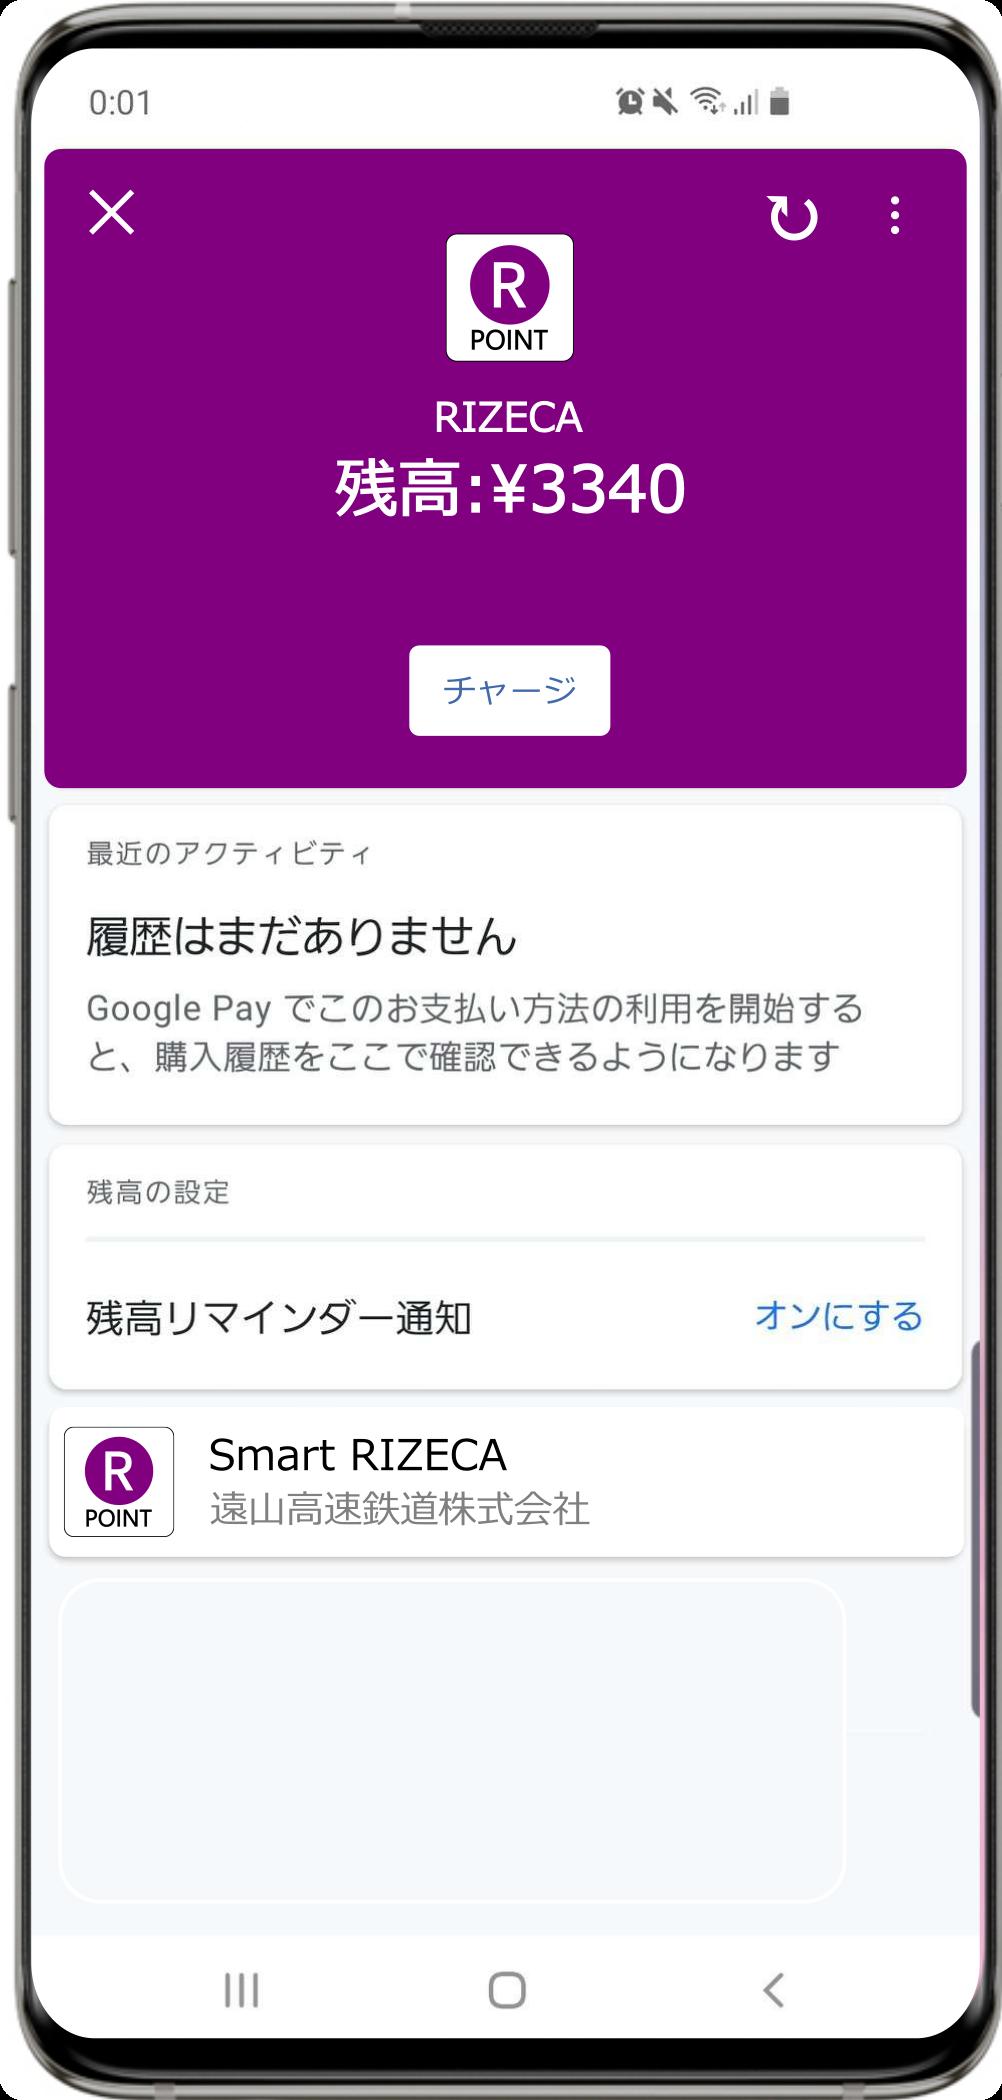 Smart Rizeca(スマホ).png